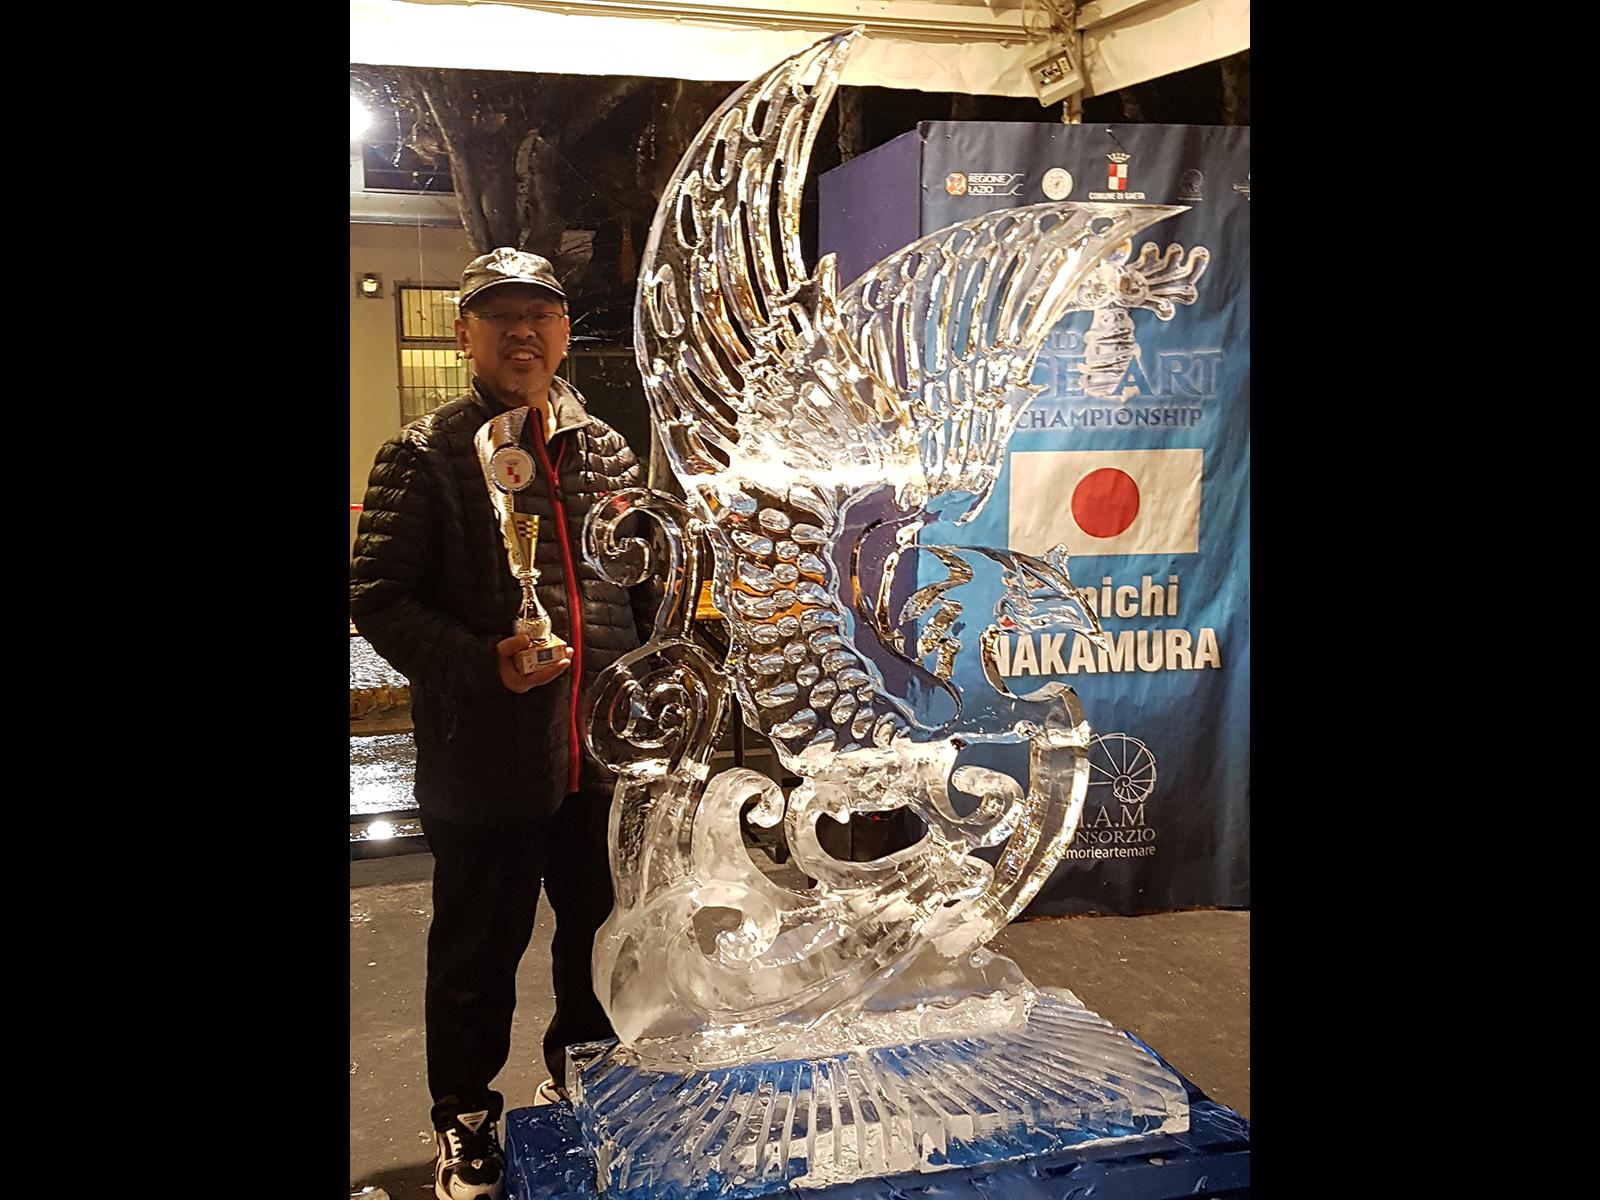 Gaeta 2019 Junichi Nakamura - Ghiaccio d'Arte